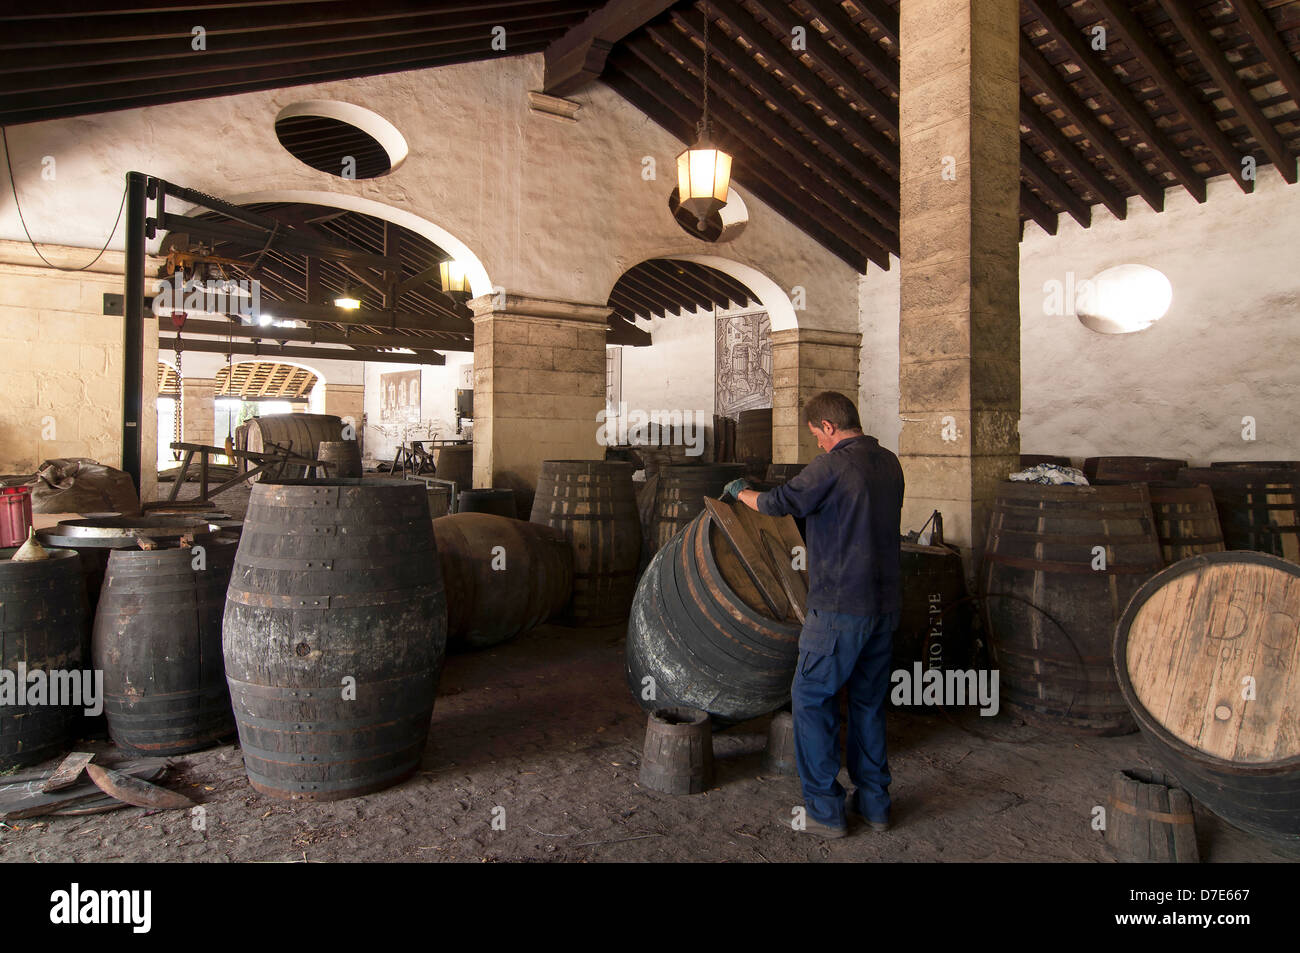 Gonzalez Byass Weingut-Reparatur von Fässern, Jerez De La Frontera, Provinz Cádiz, Region Andalusien, Stockbild